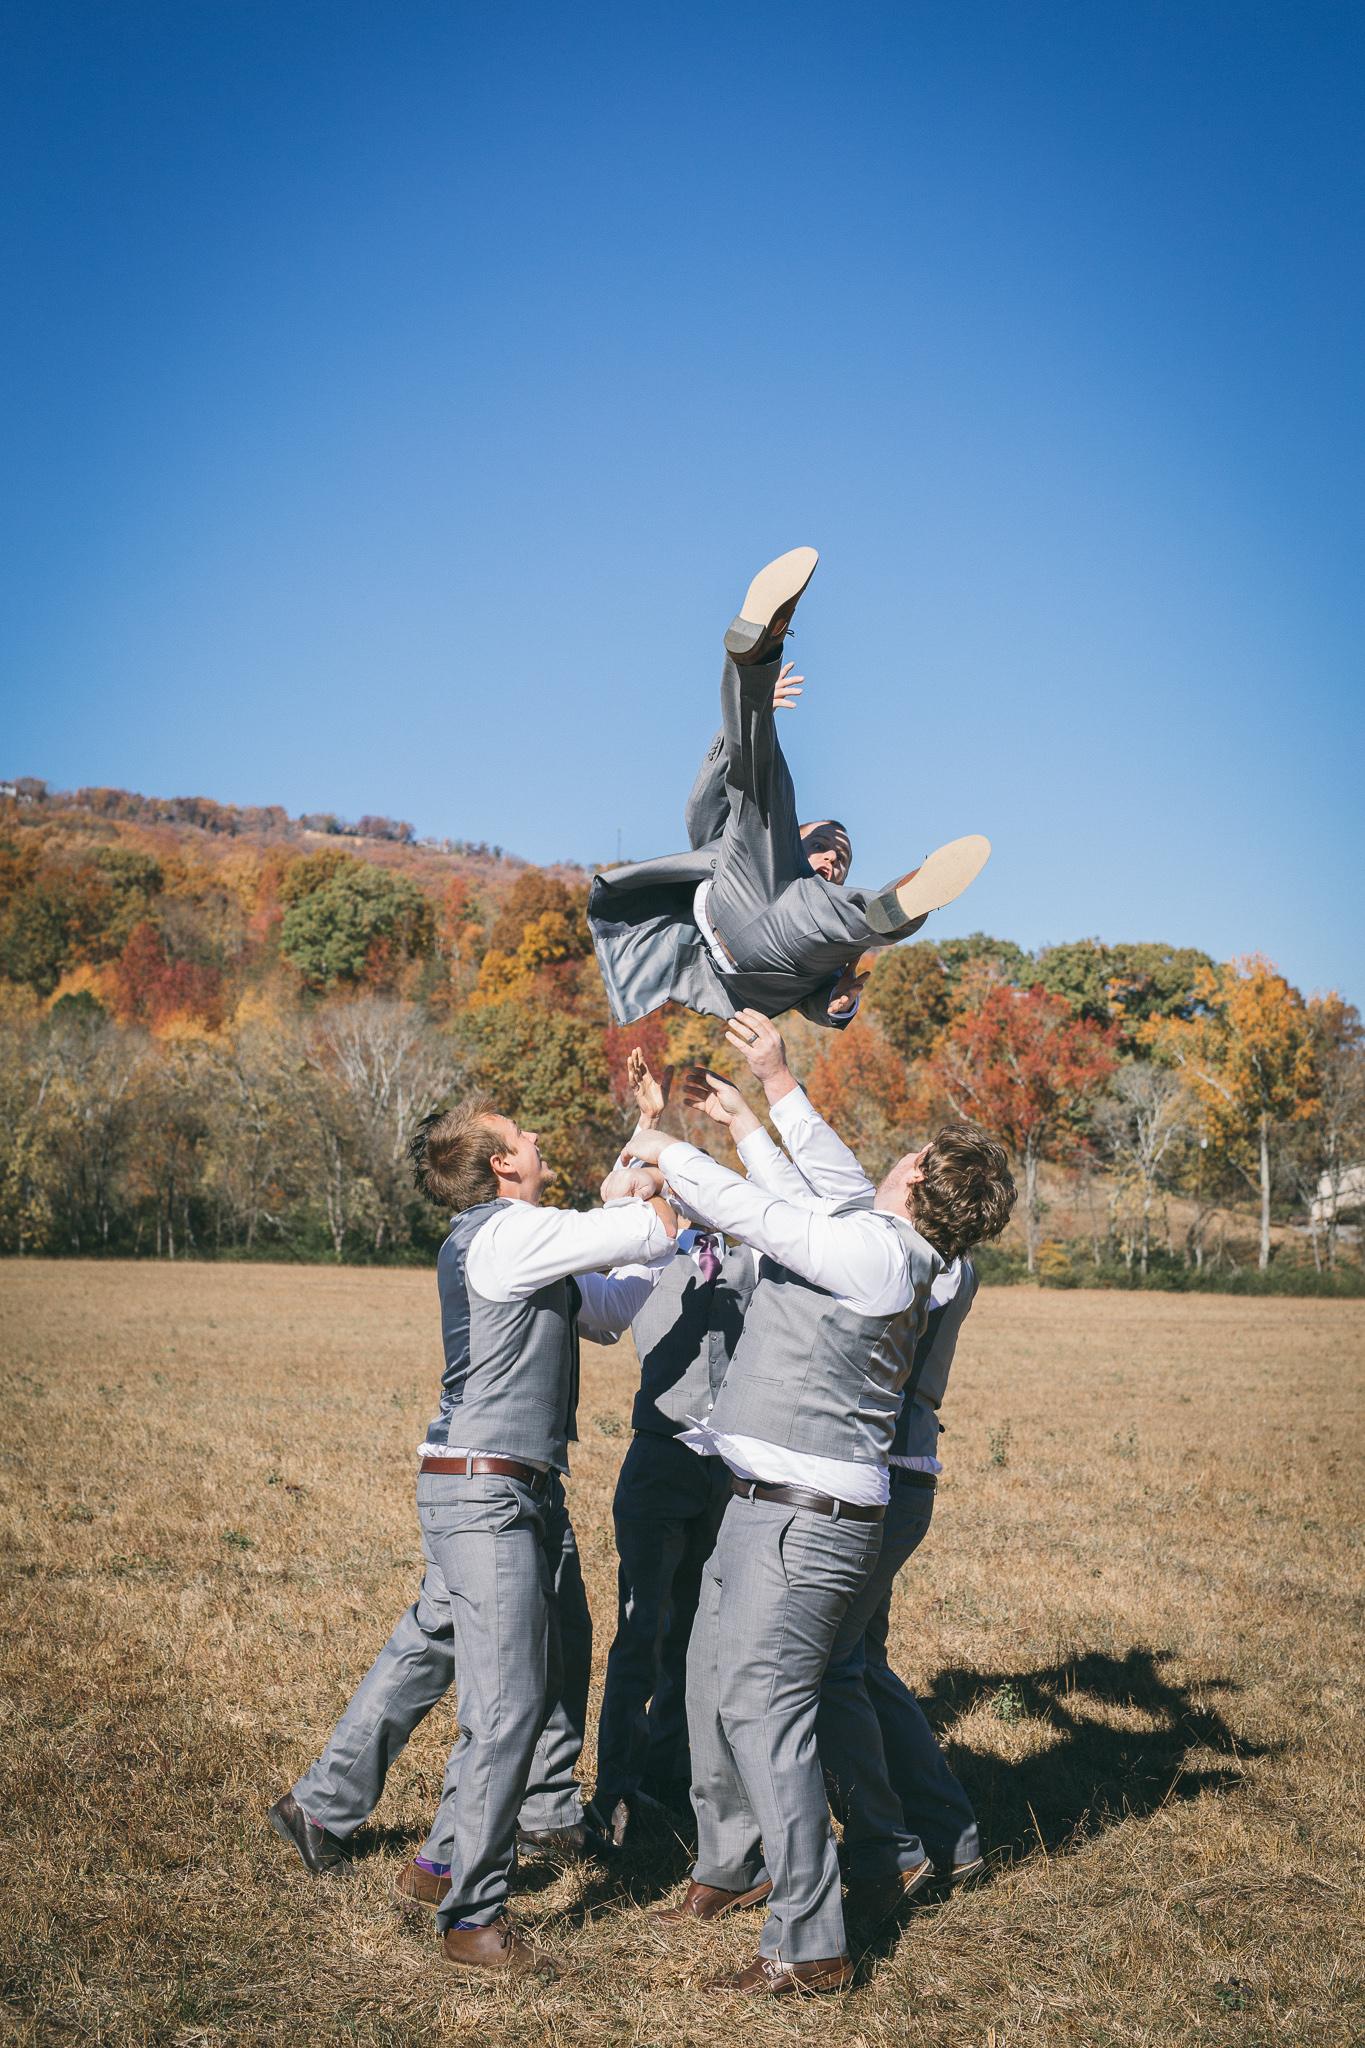 chattanooga-wedding-photographer-inimate-beautiful-tennessee-14.jpg